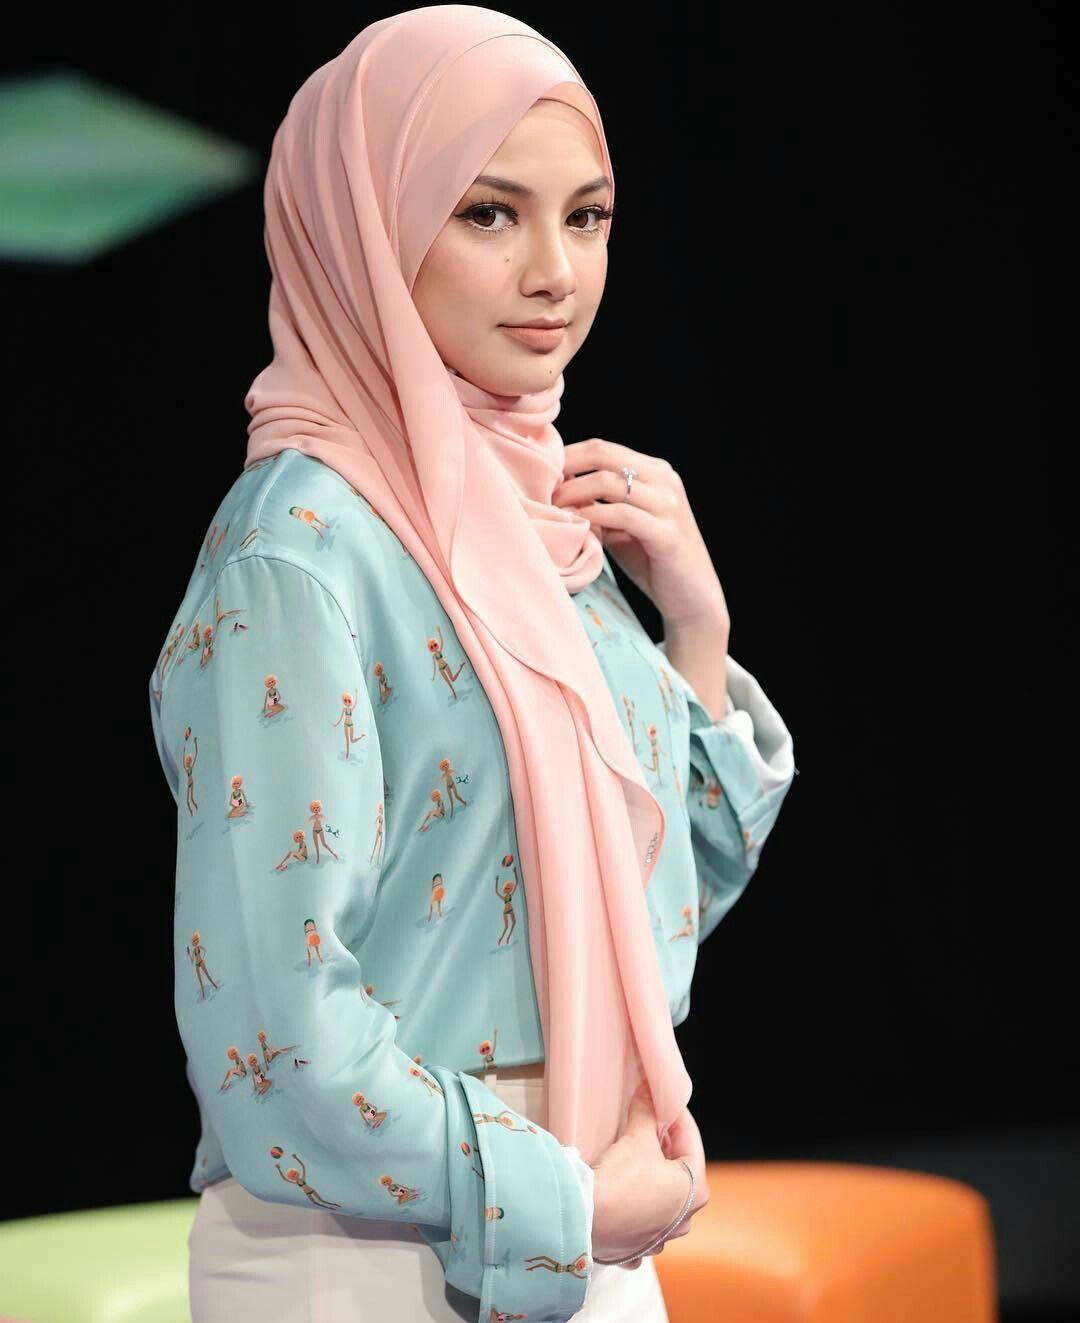 Pin by eynaa zubir on neelofa | Pinterest | Beautiful hijab, Modest ...